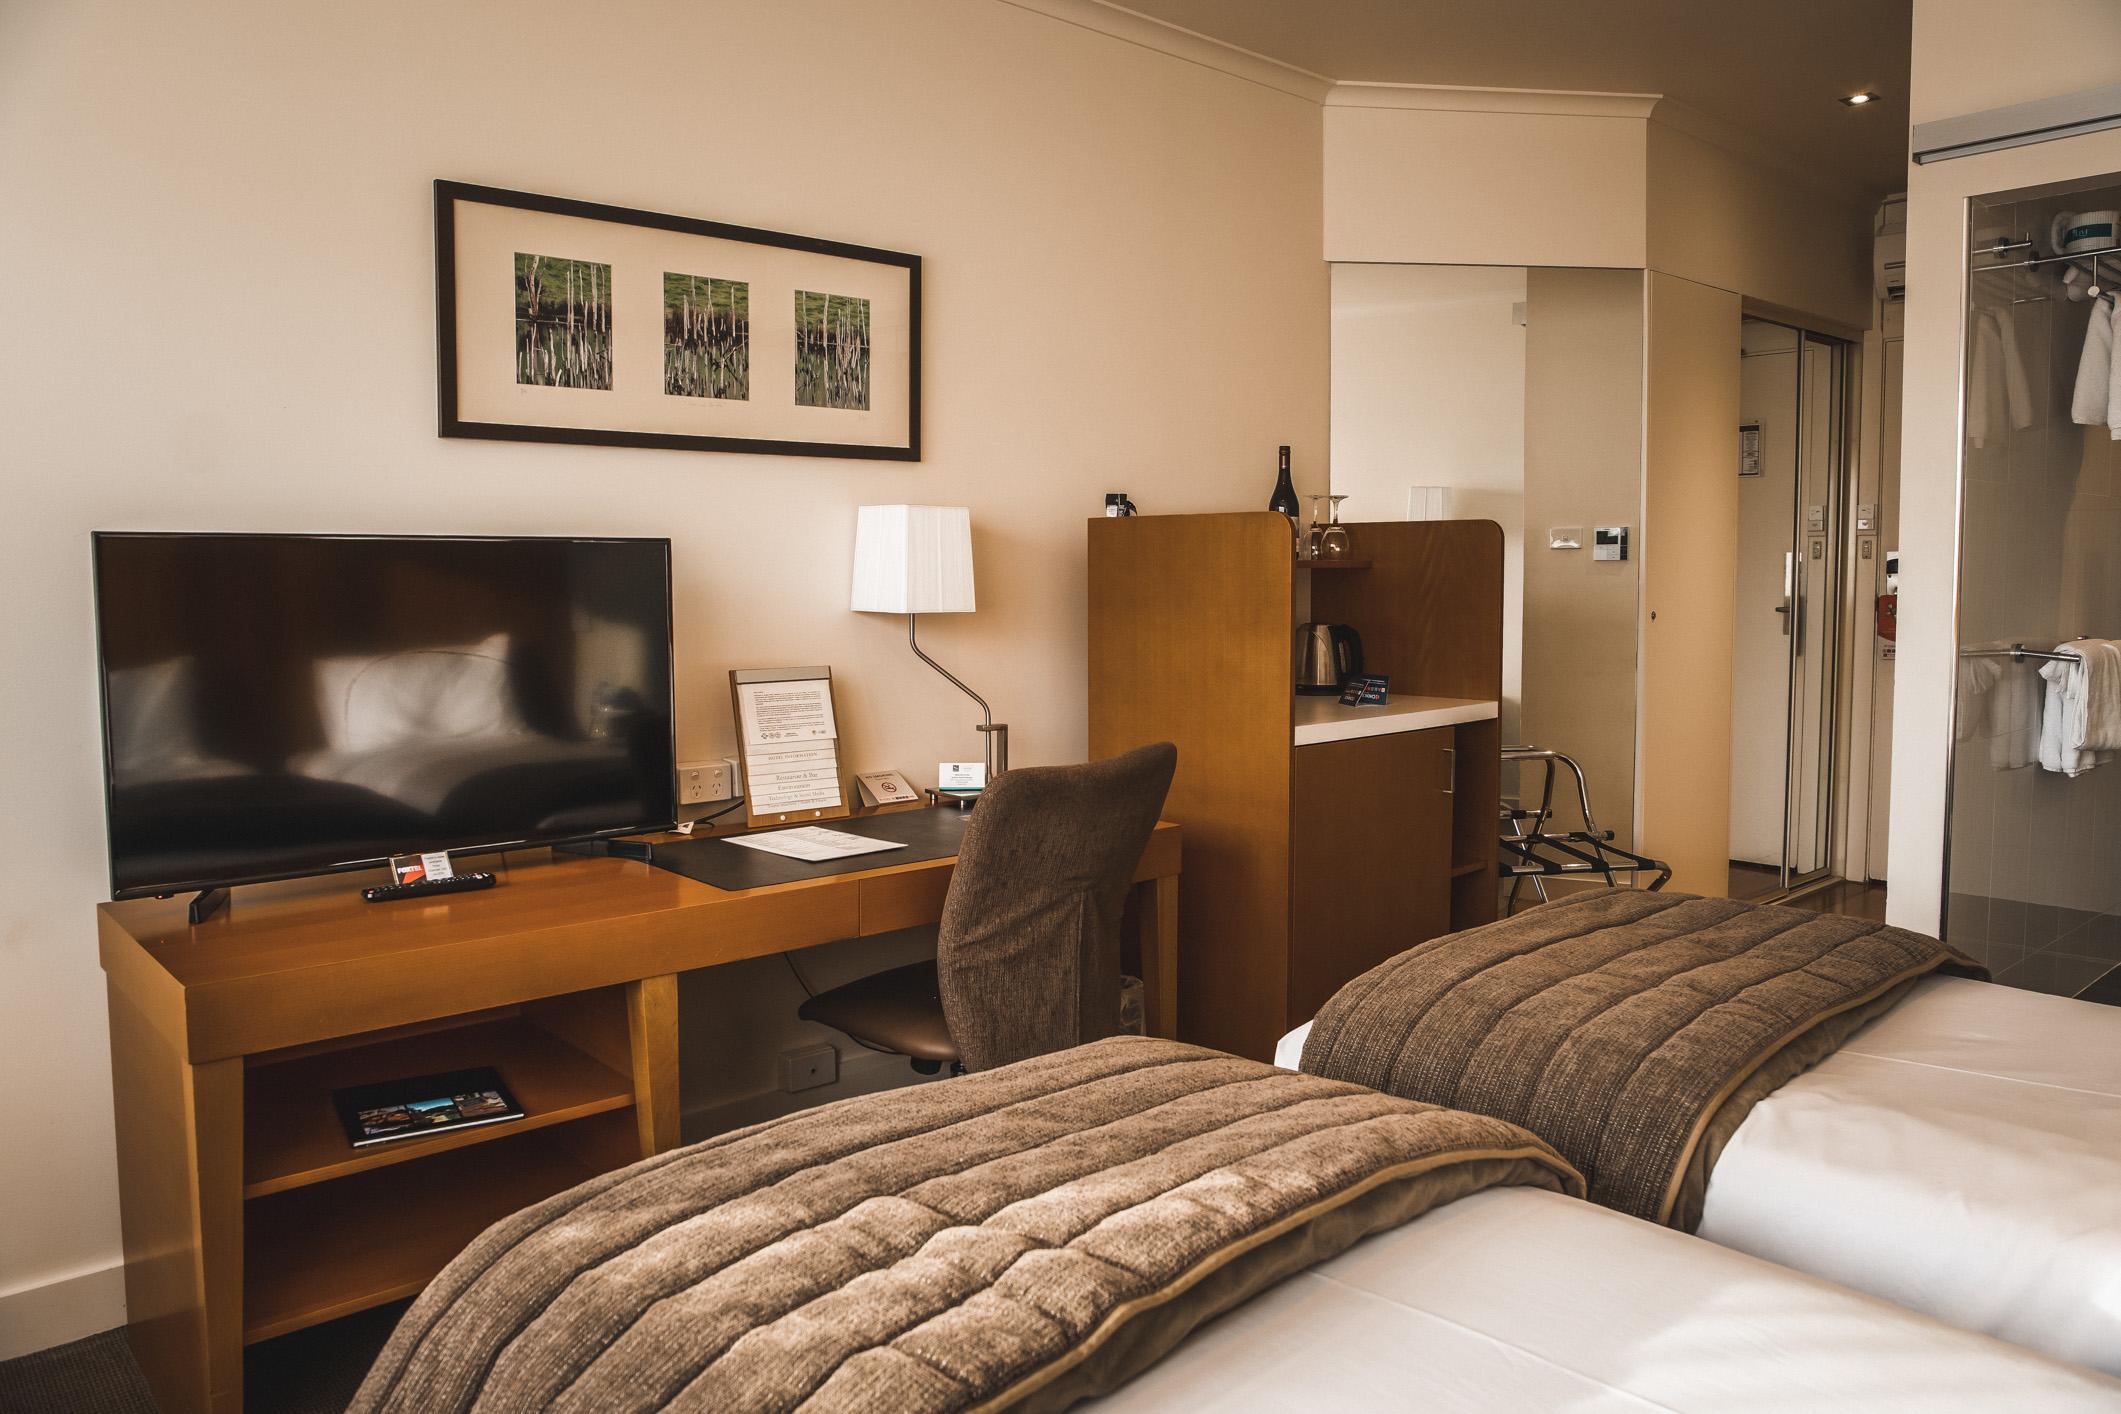 Gateway Hotel (Web) (1 of 15).jpg